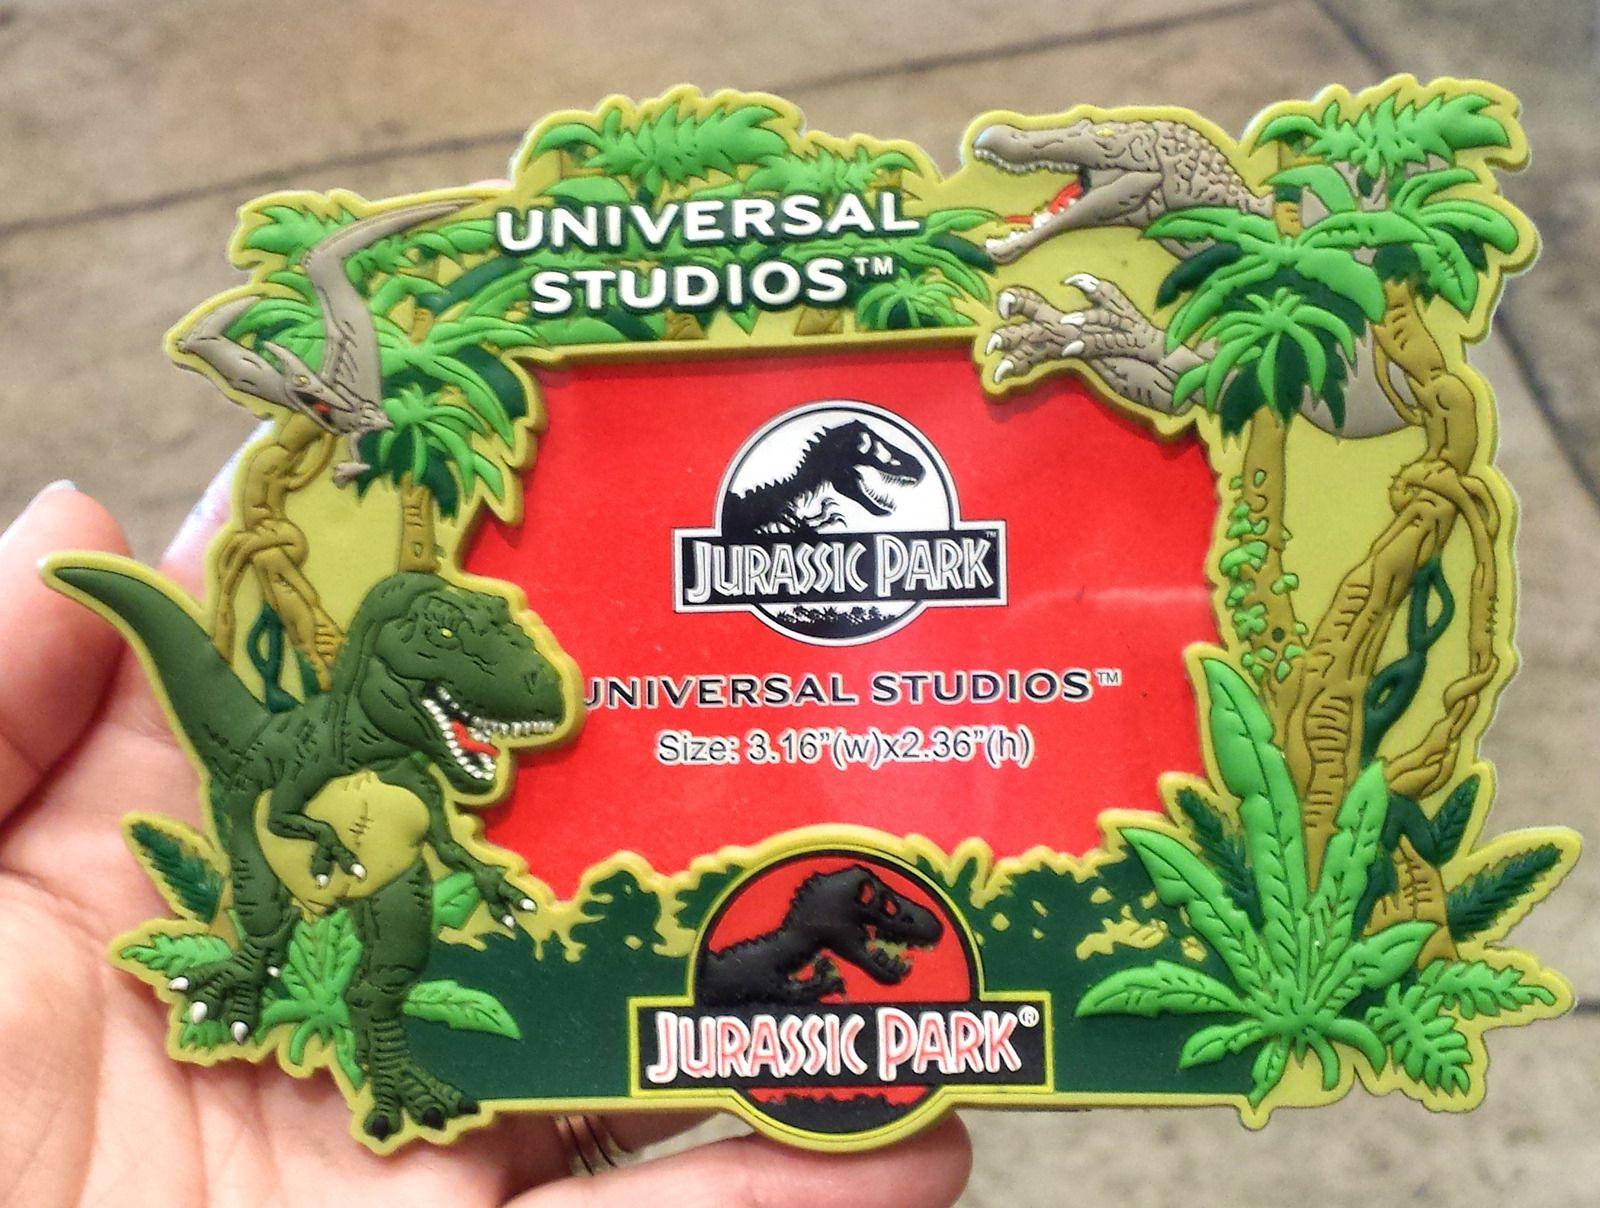 Jurassic Park Dinosaurs Photo Frame Magnet 3x2 Pvc Universal Studios New Jurassicworld From Kimberly1337